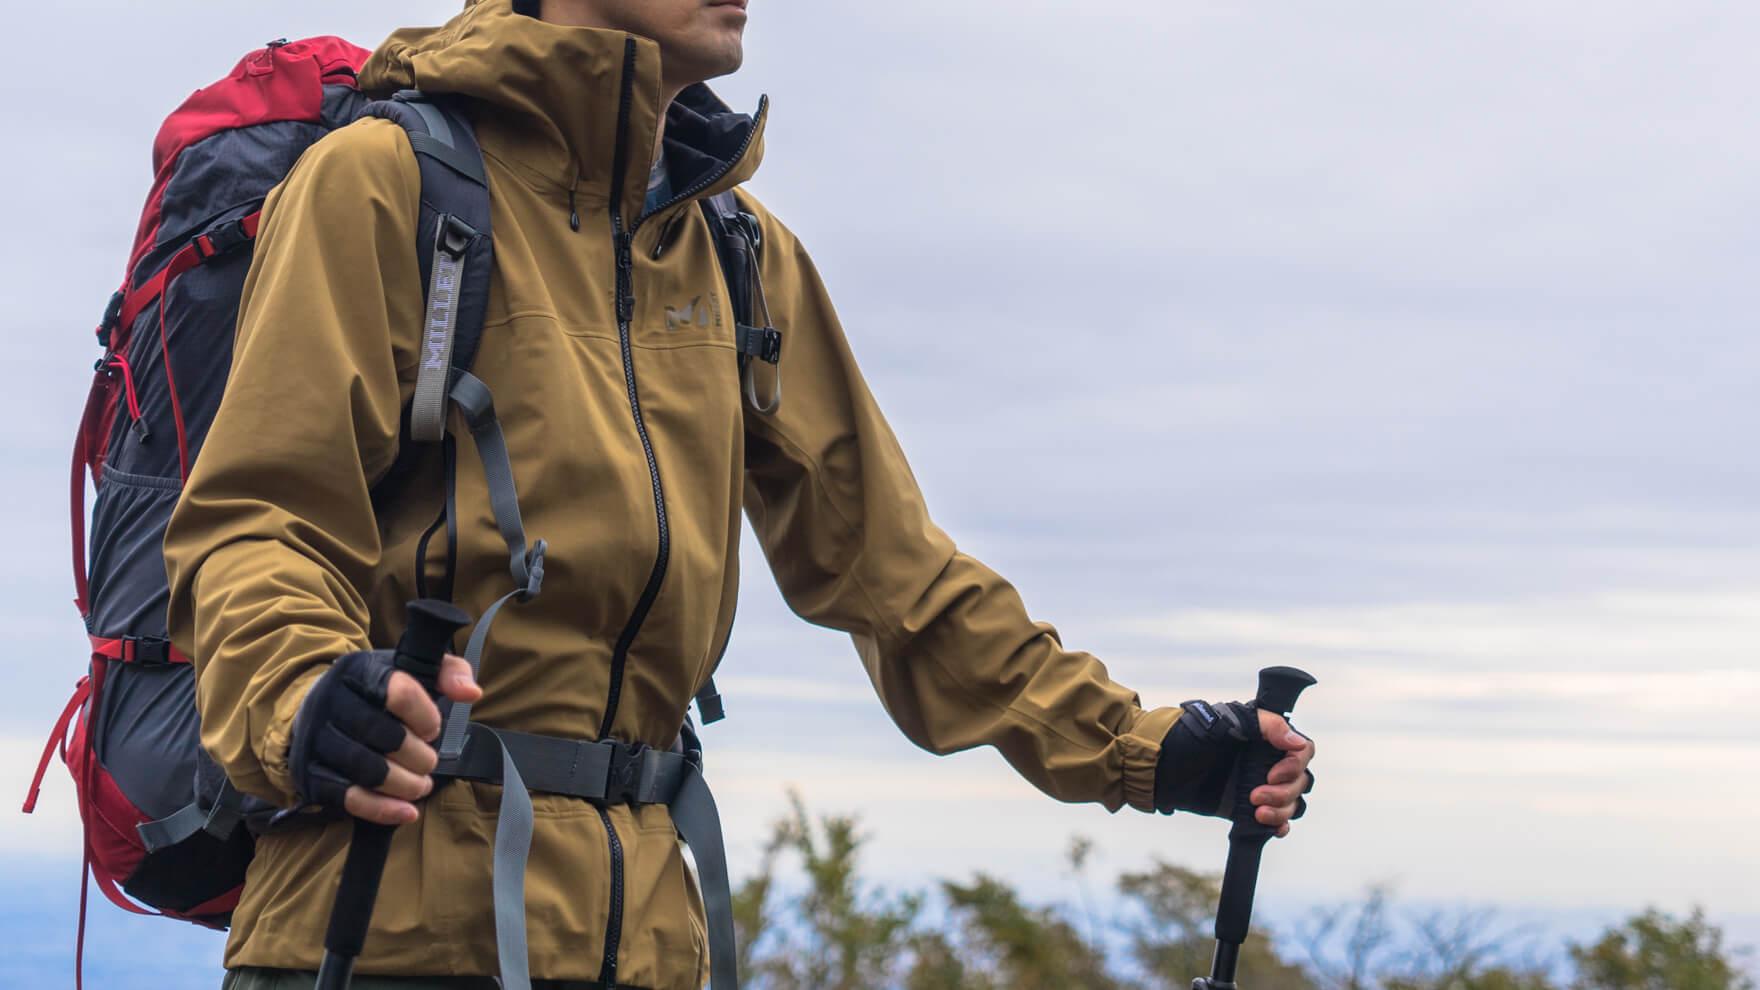 Review:MILLET ティフォン 50000 ウォーム ストレッチ ジャケット 防水・高透湿・伸縮・保温でもって着心地好し。これ以上何を望みますか?